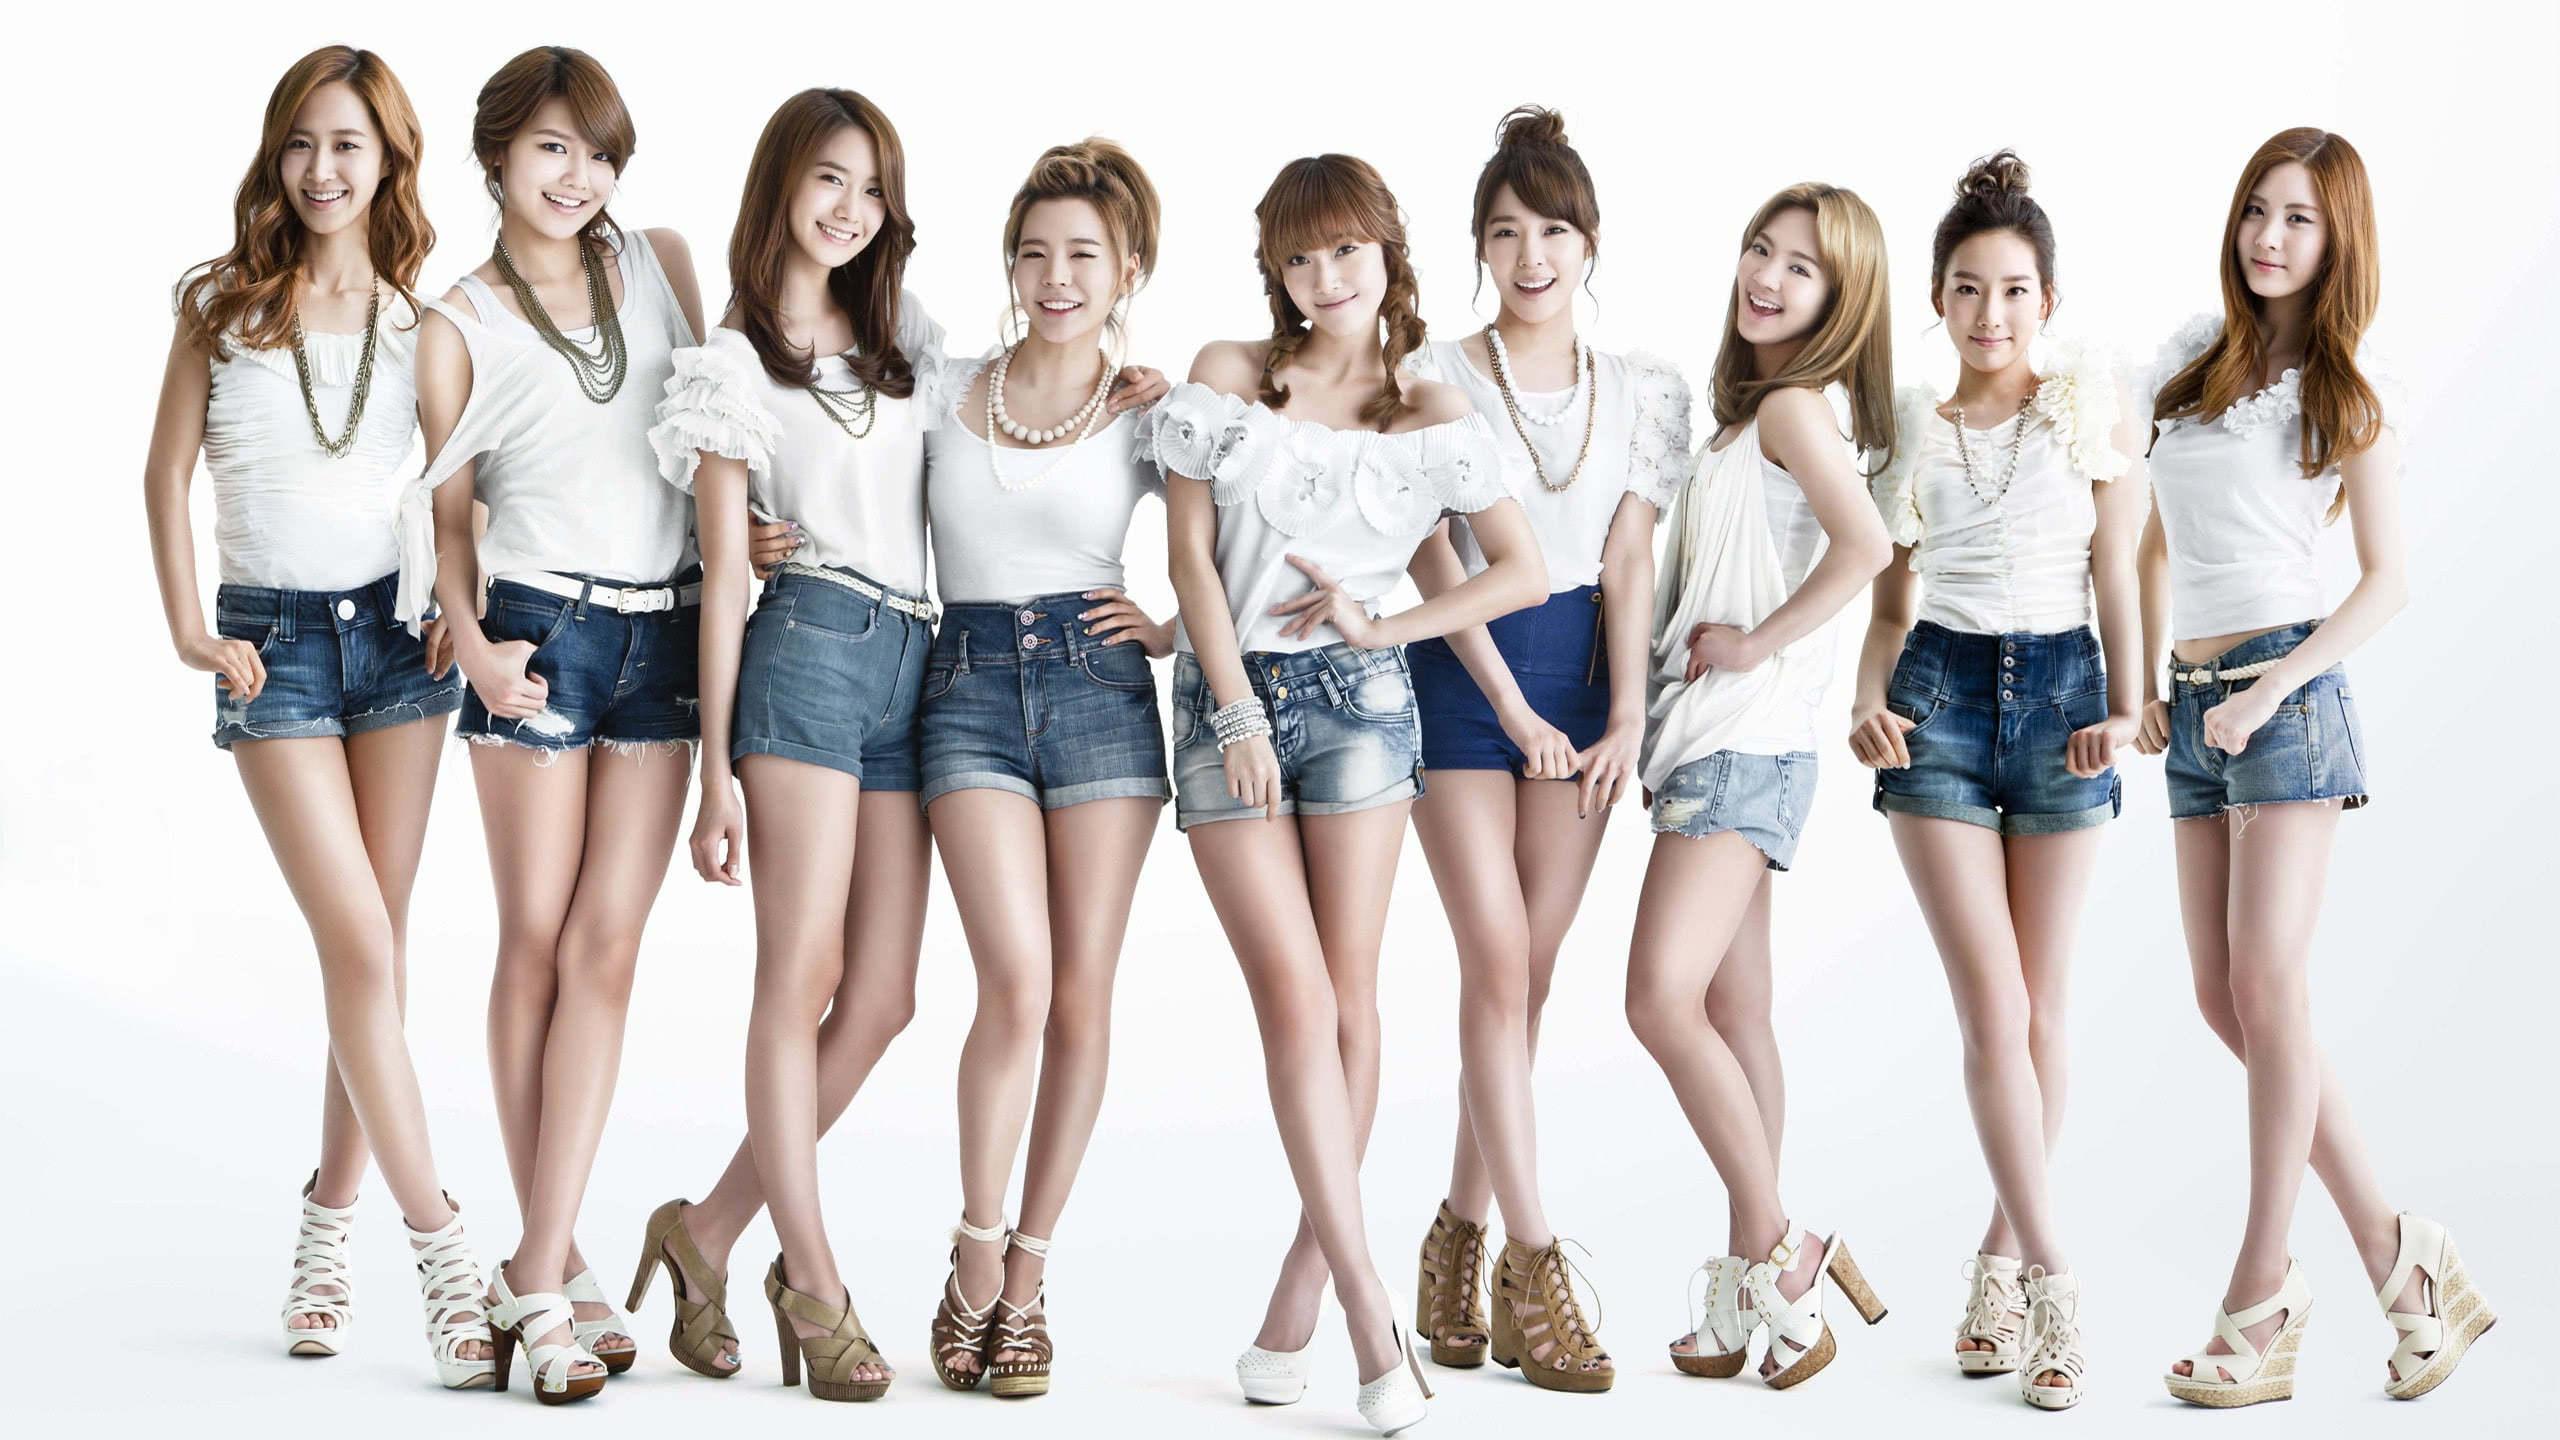 snsd girls generation photoshoot wqhd 1440p wallpaper